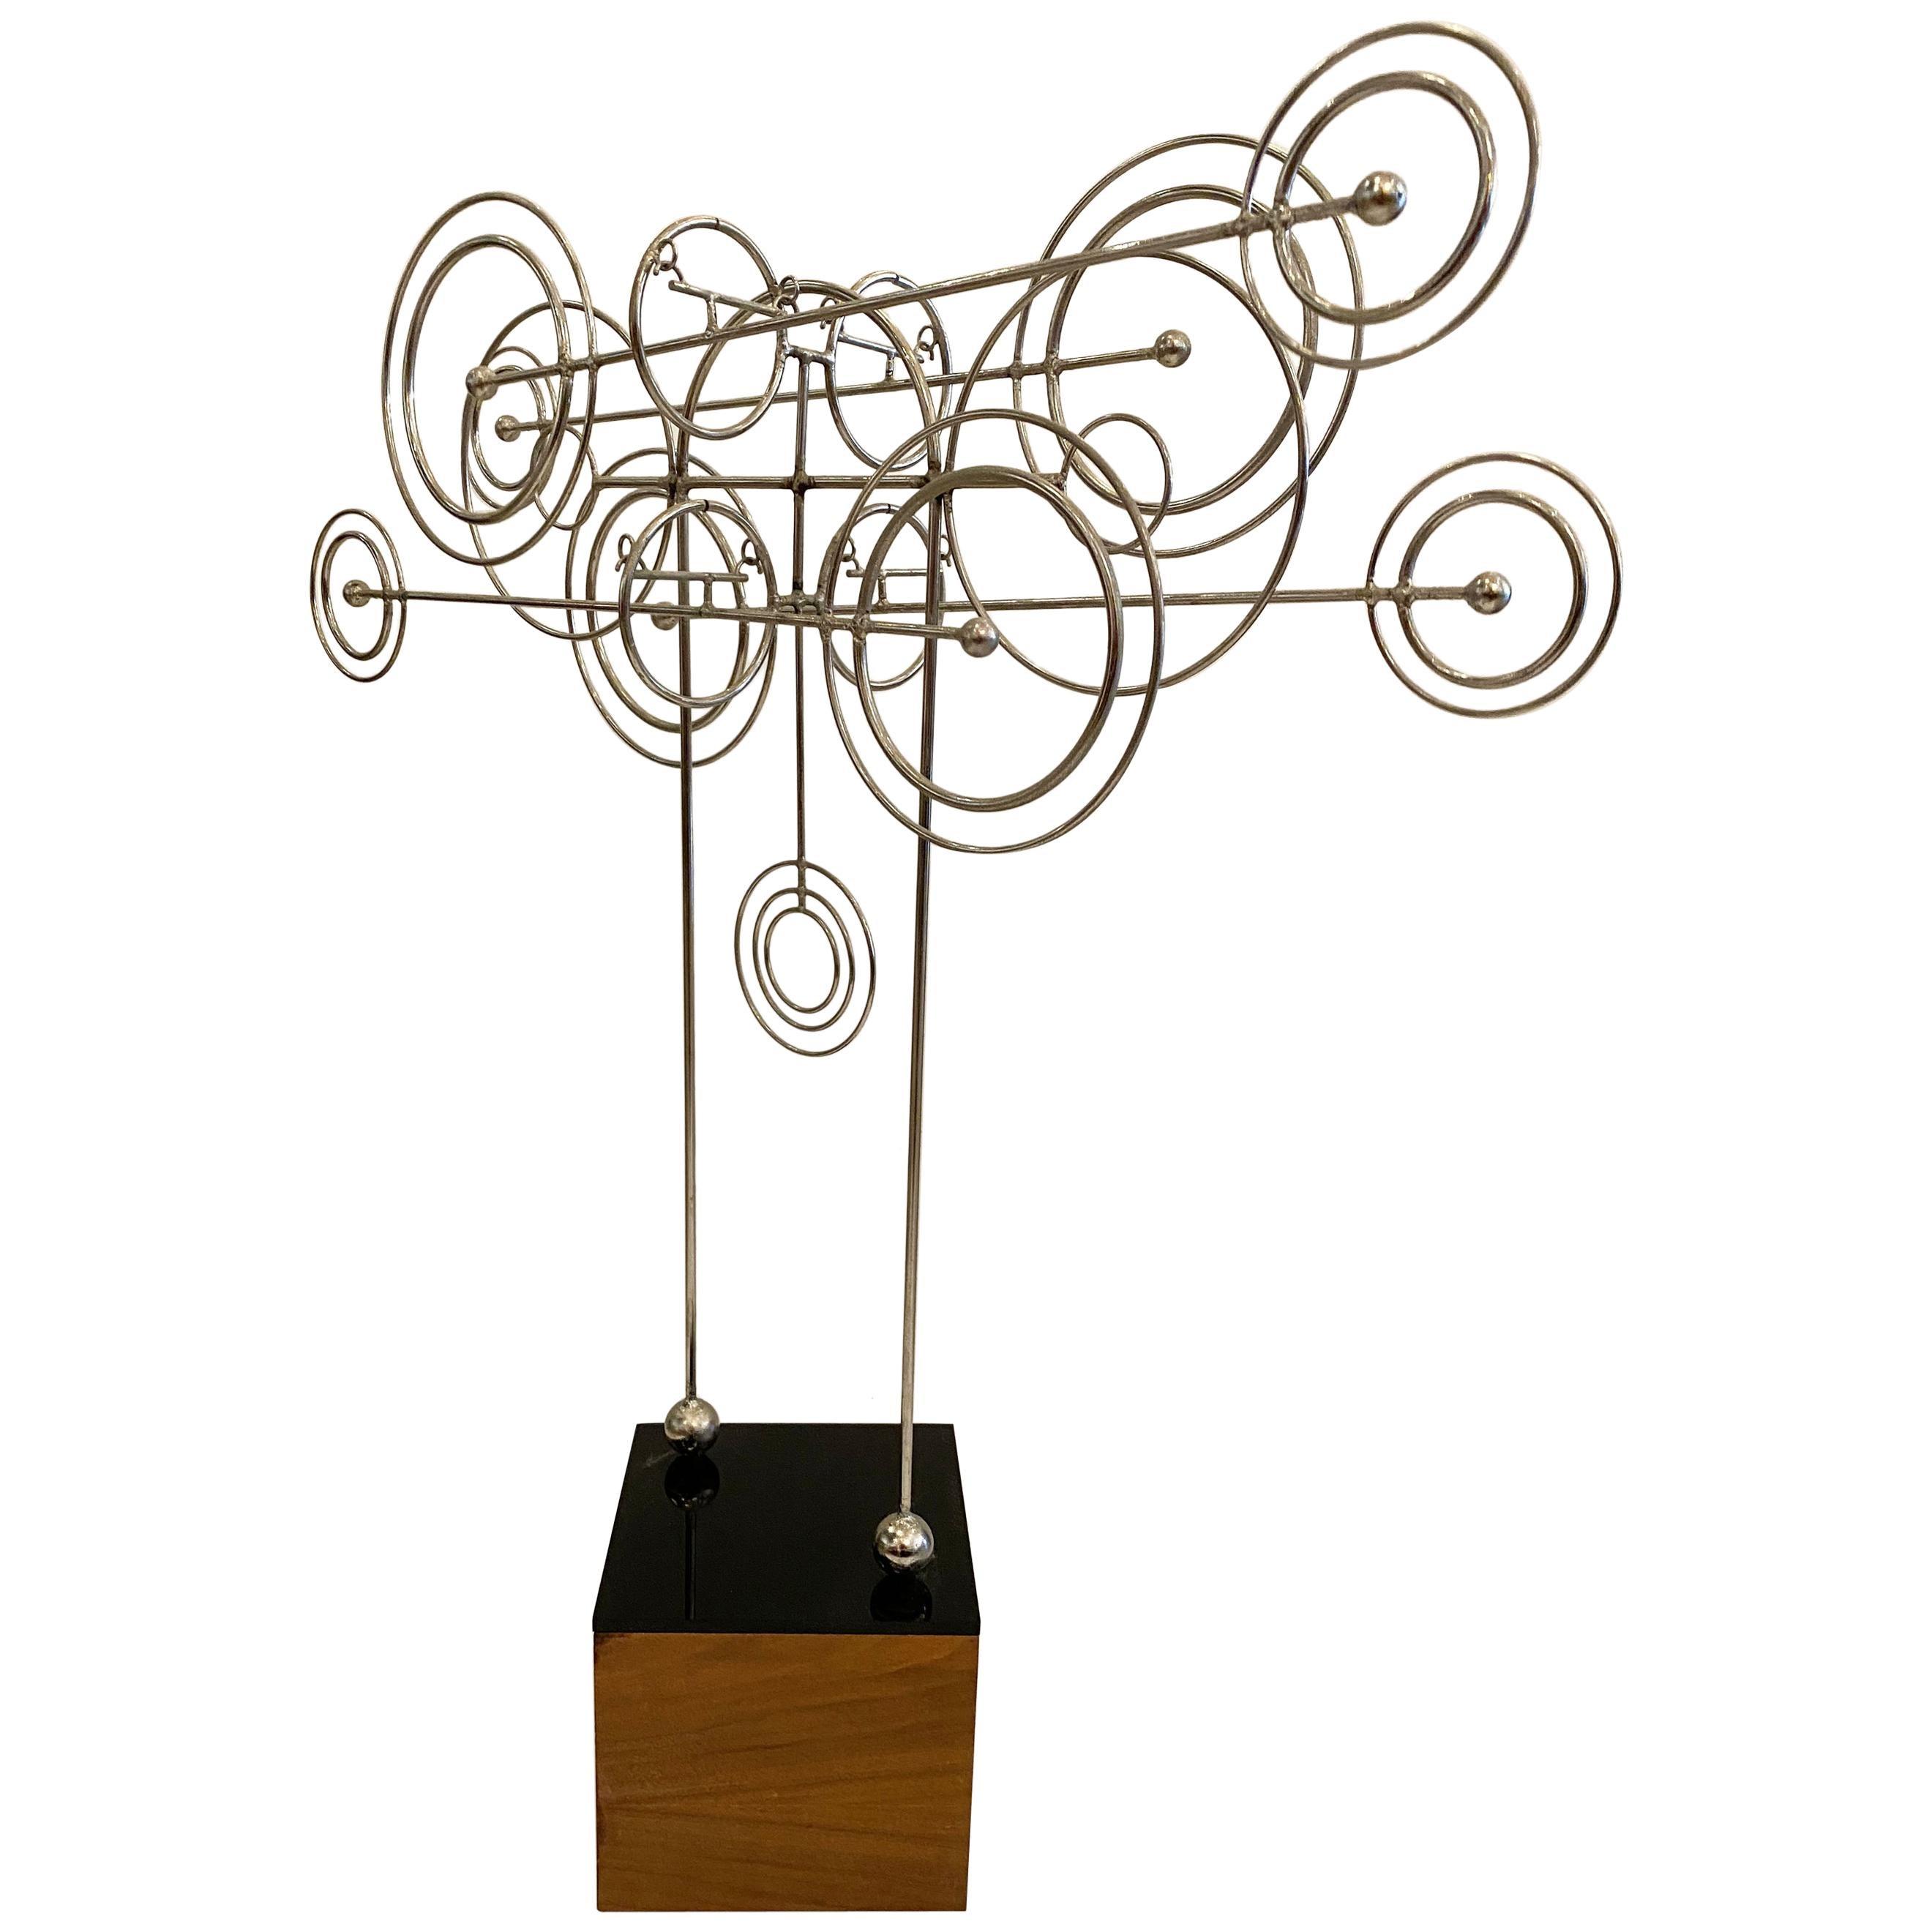 Kinetic Metal Sculpture by Joseph A. Burlini